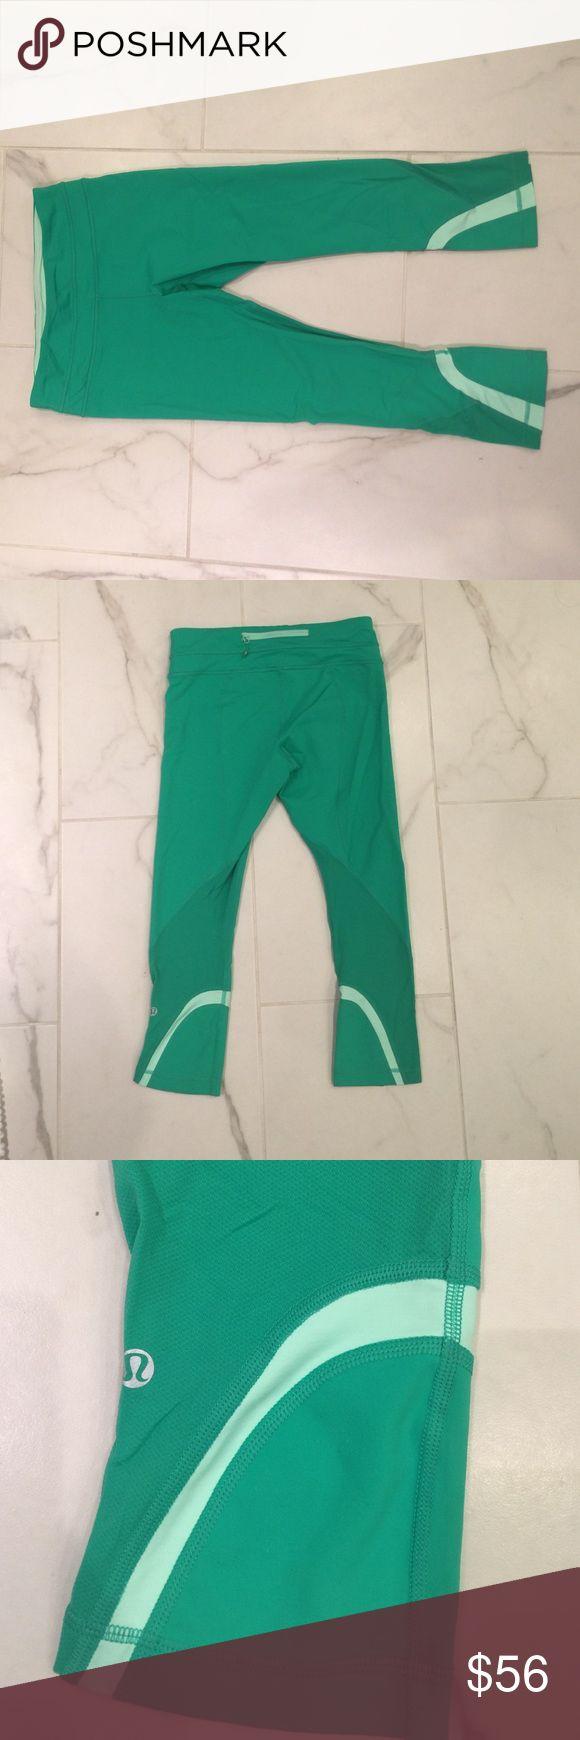 Lulu lemon runinspire crops Green crop leggings with light green detail. Worn few times. Size 6. lululemon athletica Pants Ankle & Cropped